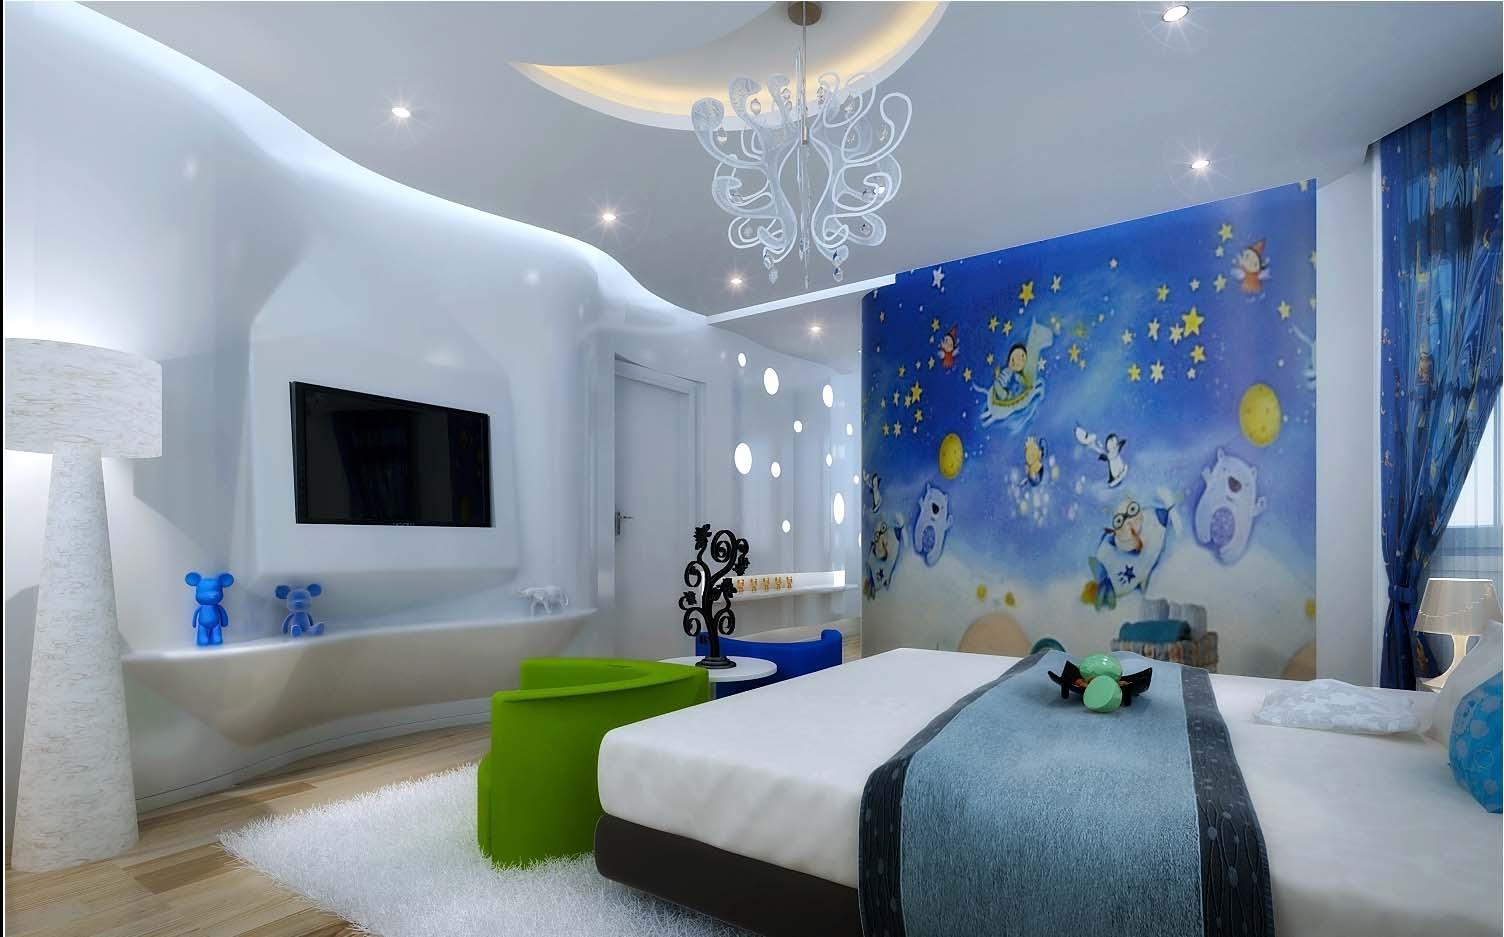 Kids Bedroom 3d Model 3d model kids bedroom with tv | cgtrader